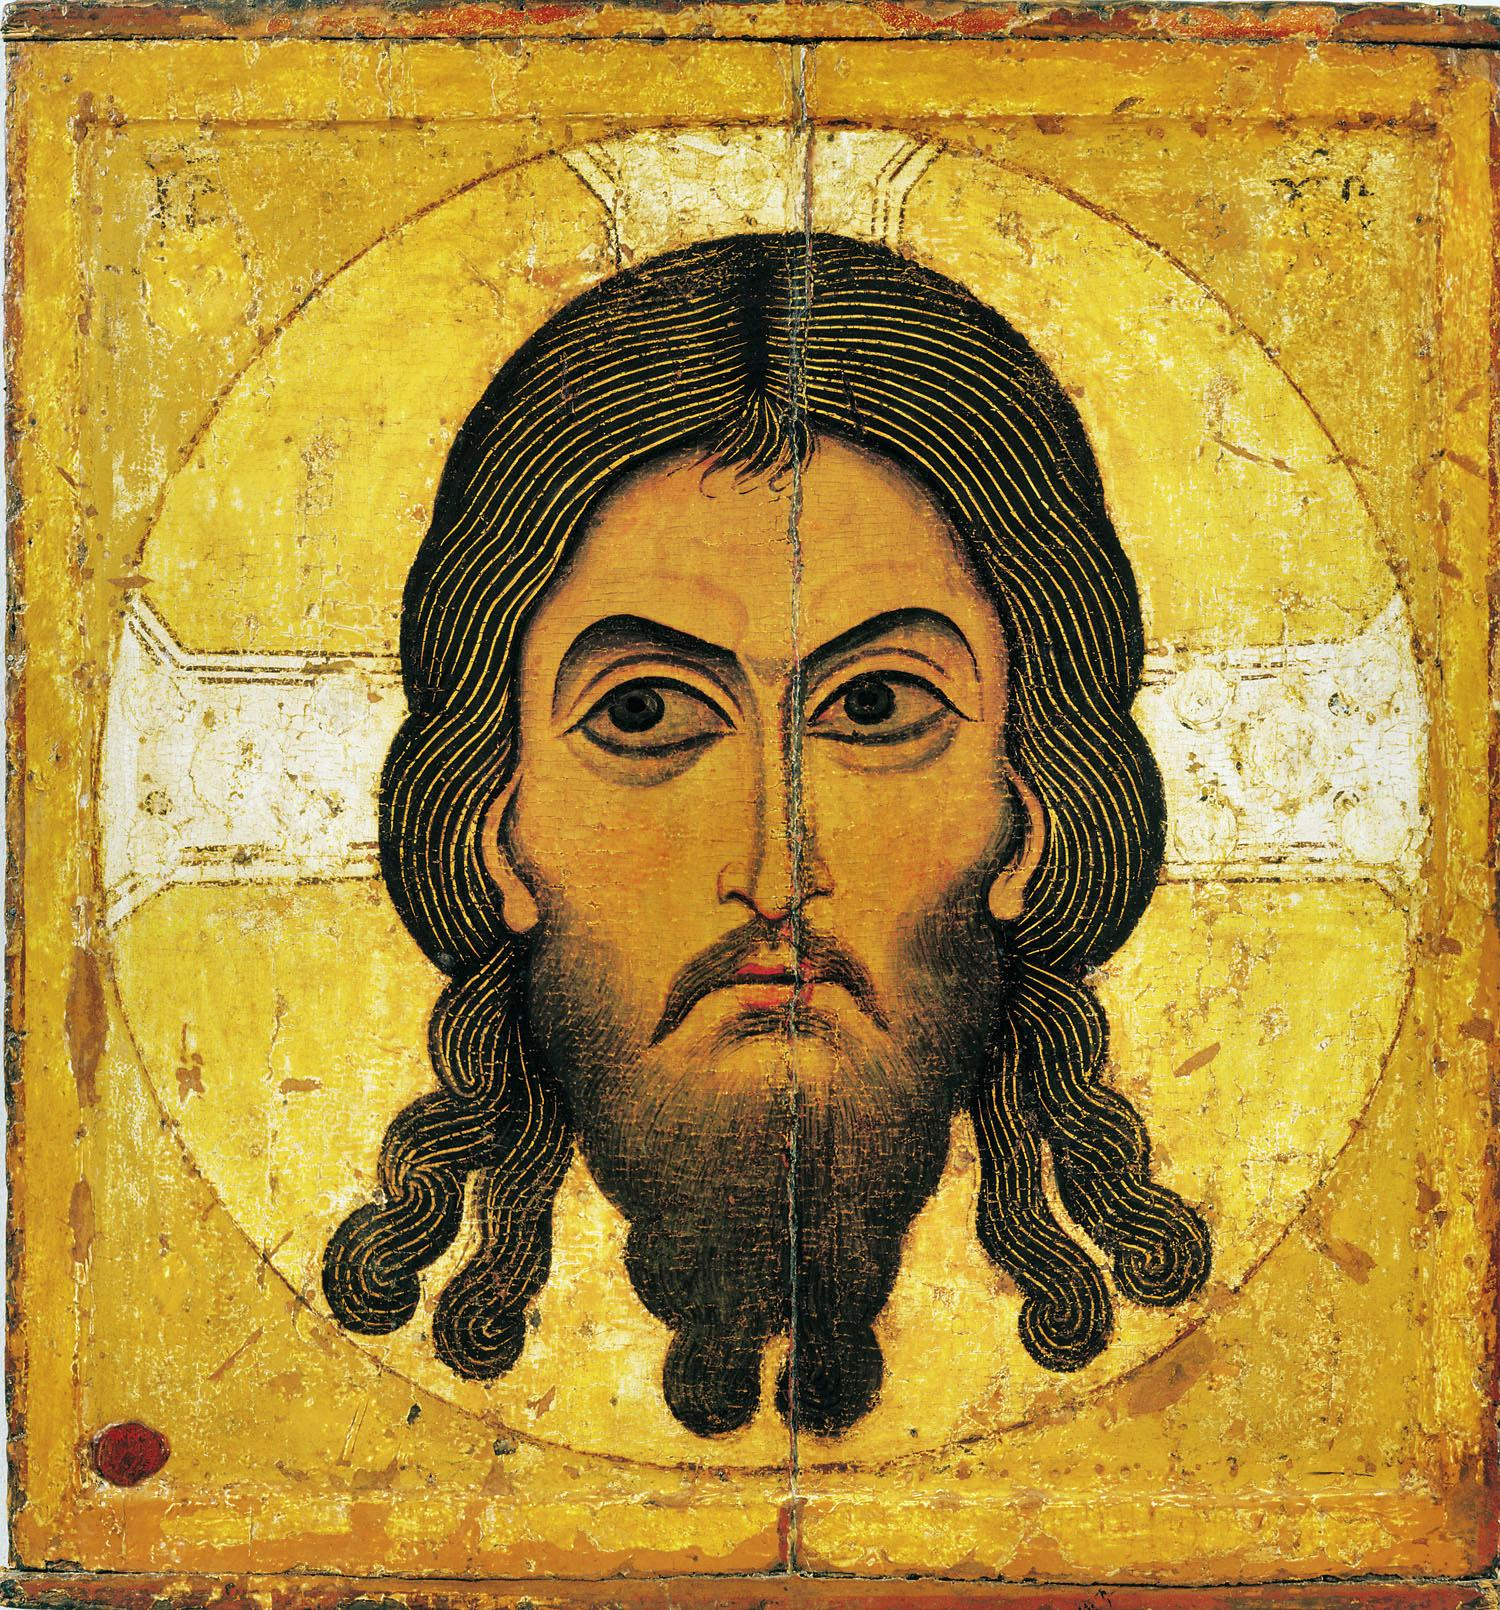 Christos_Acheiropoietos-Non-hand-made-image-of-Jesus-Christ-given-to-King-Abgar